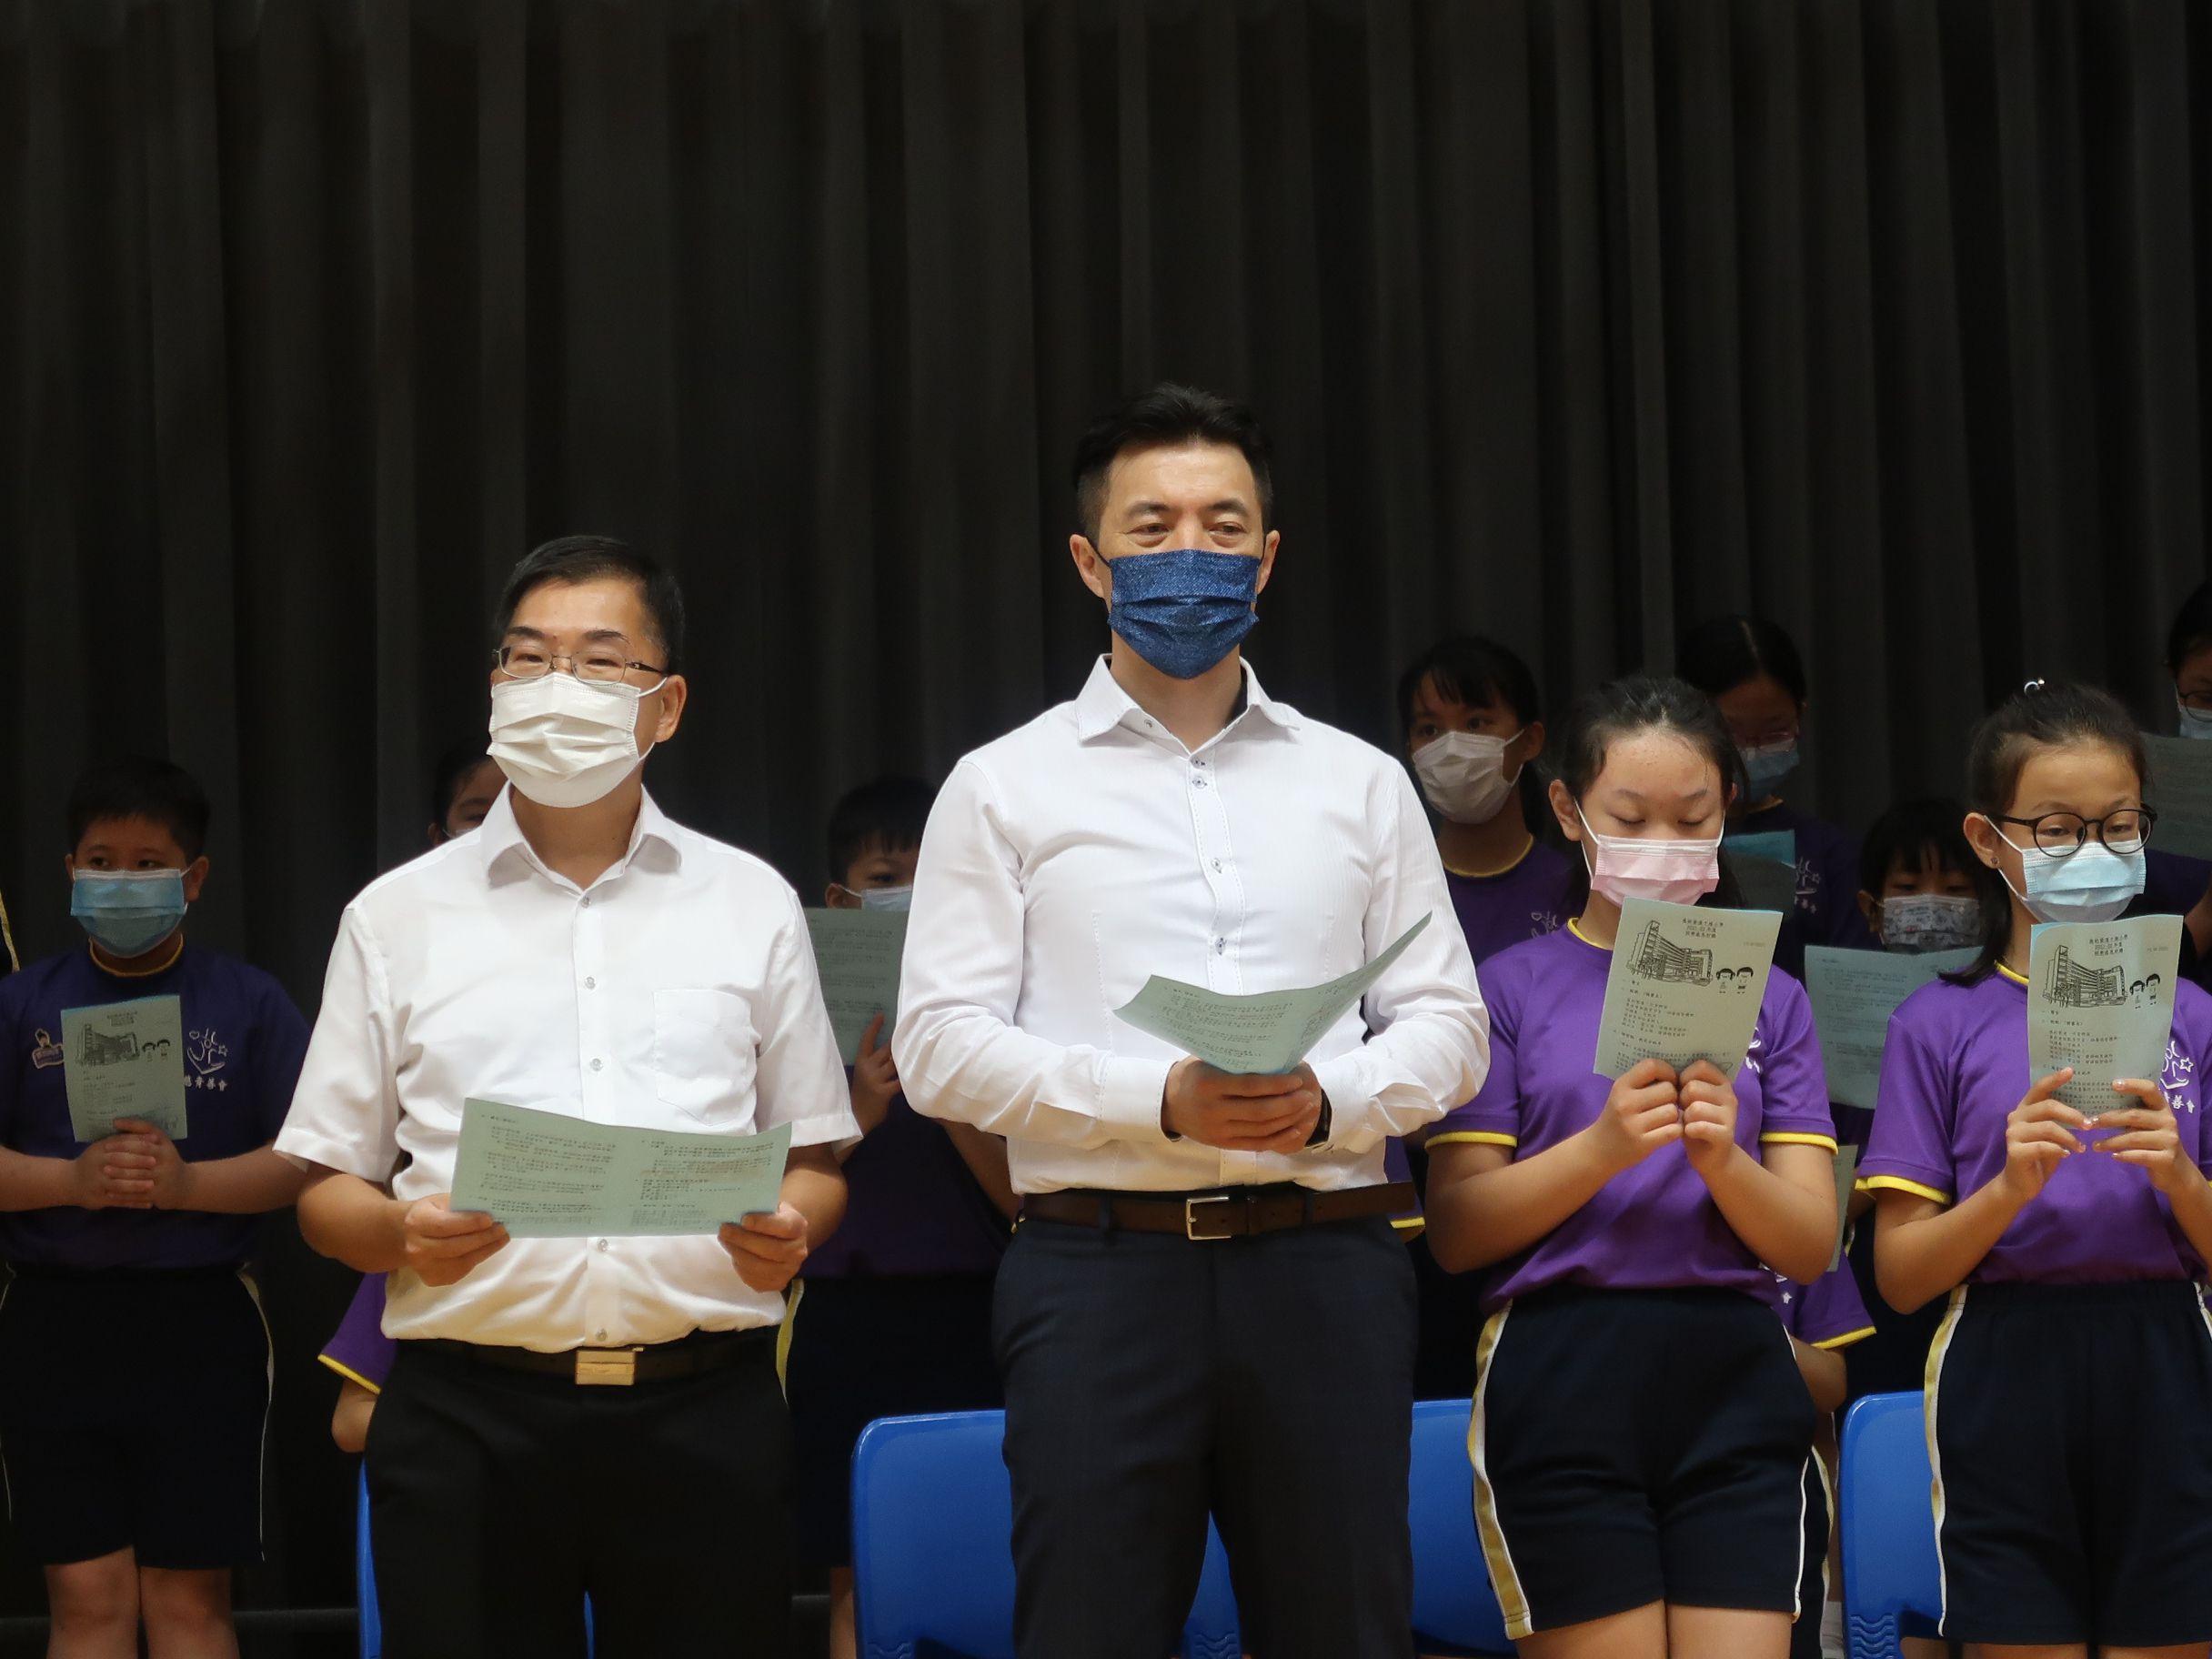 https://syh.edu.hk/sites/default/files/img_7616_1.jpg